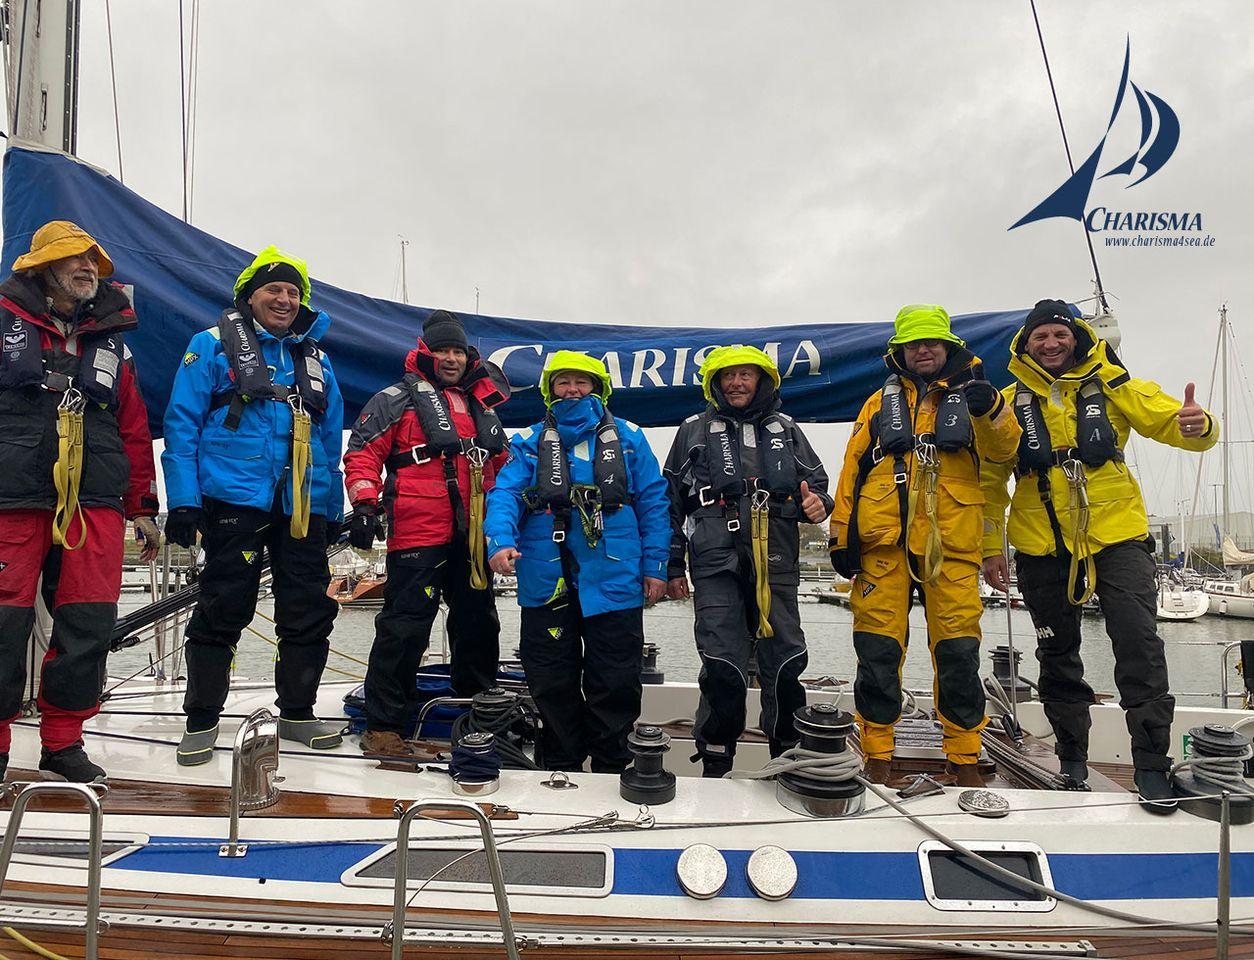 Crew Schwerwettertraining IG Skipper CCS